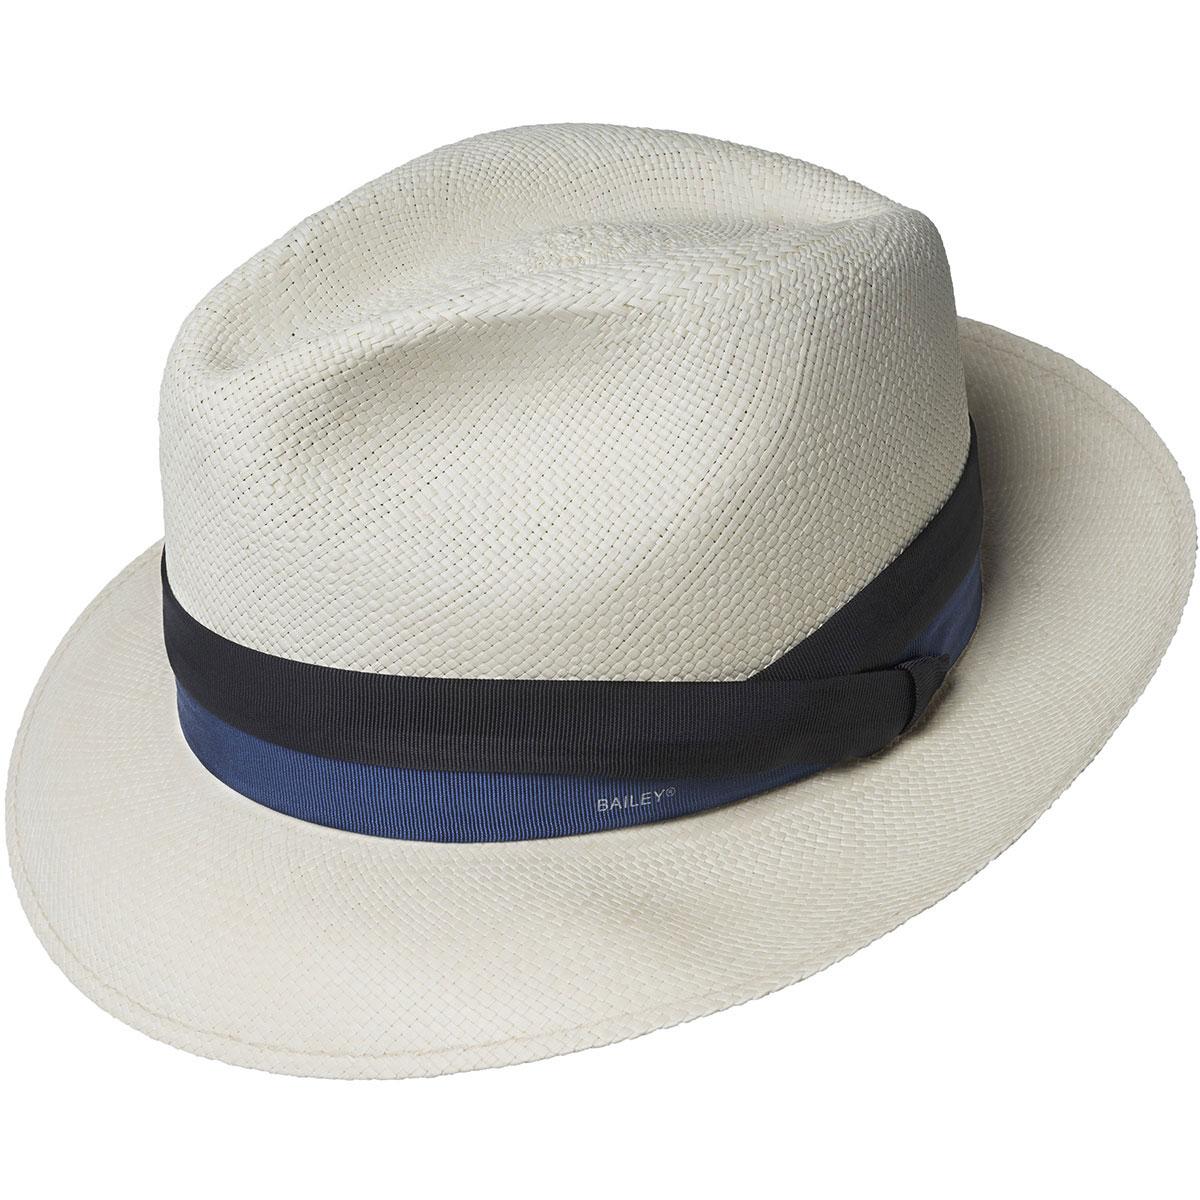 1940s Mens Hats | Fedora, Homburg, Pork Pie Hats Cuban Panama Fedora $170.00 AT vintagedancer.com